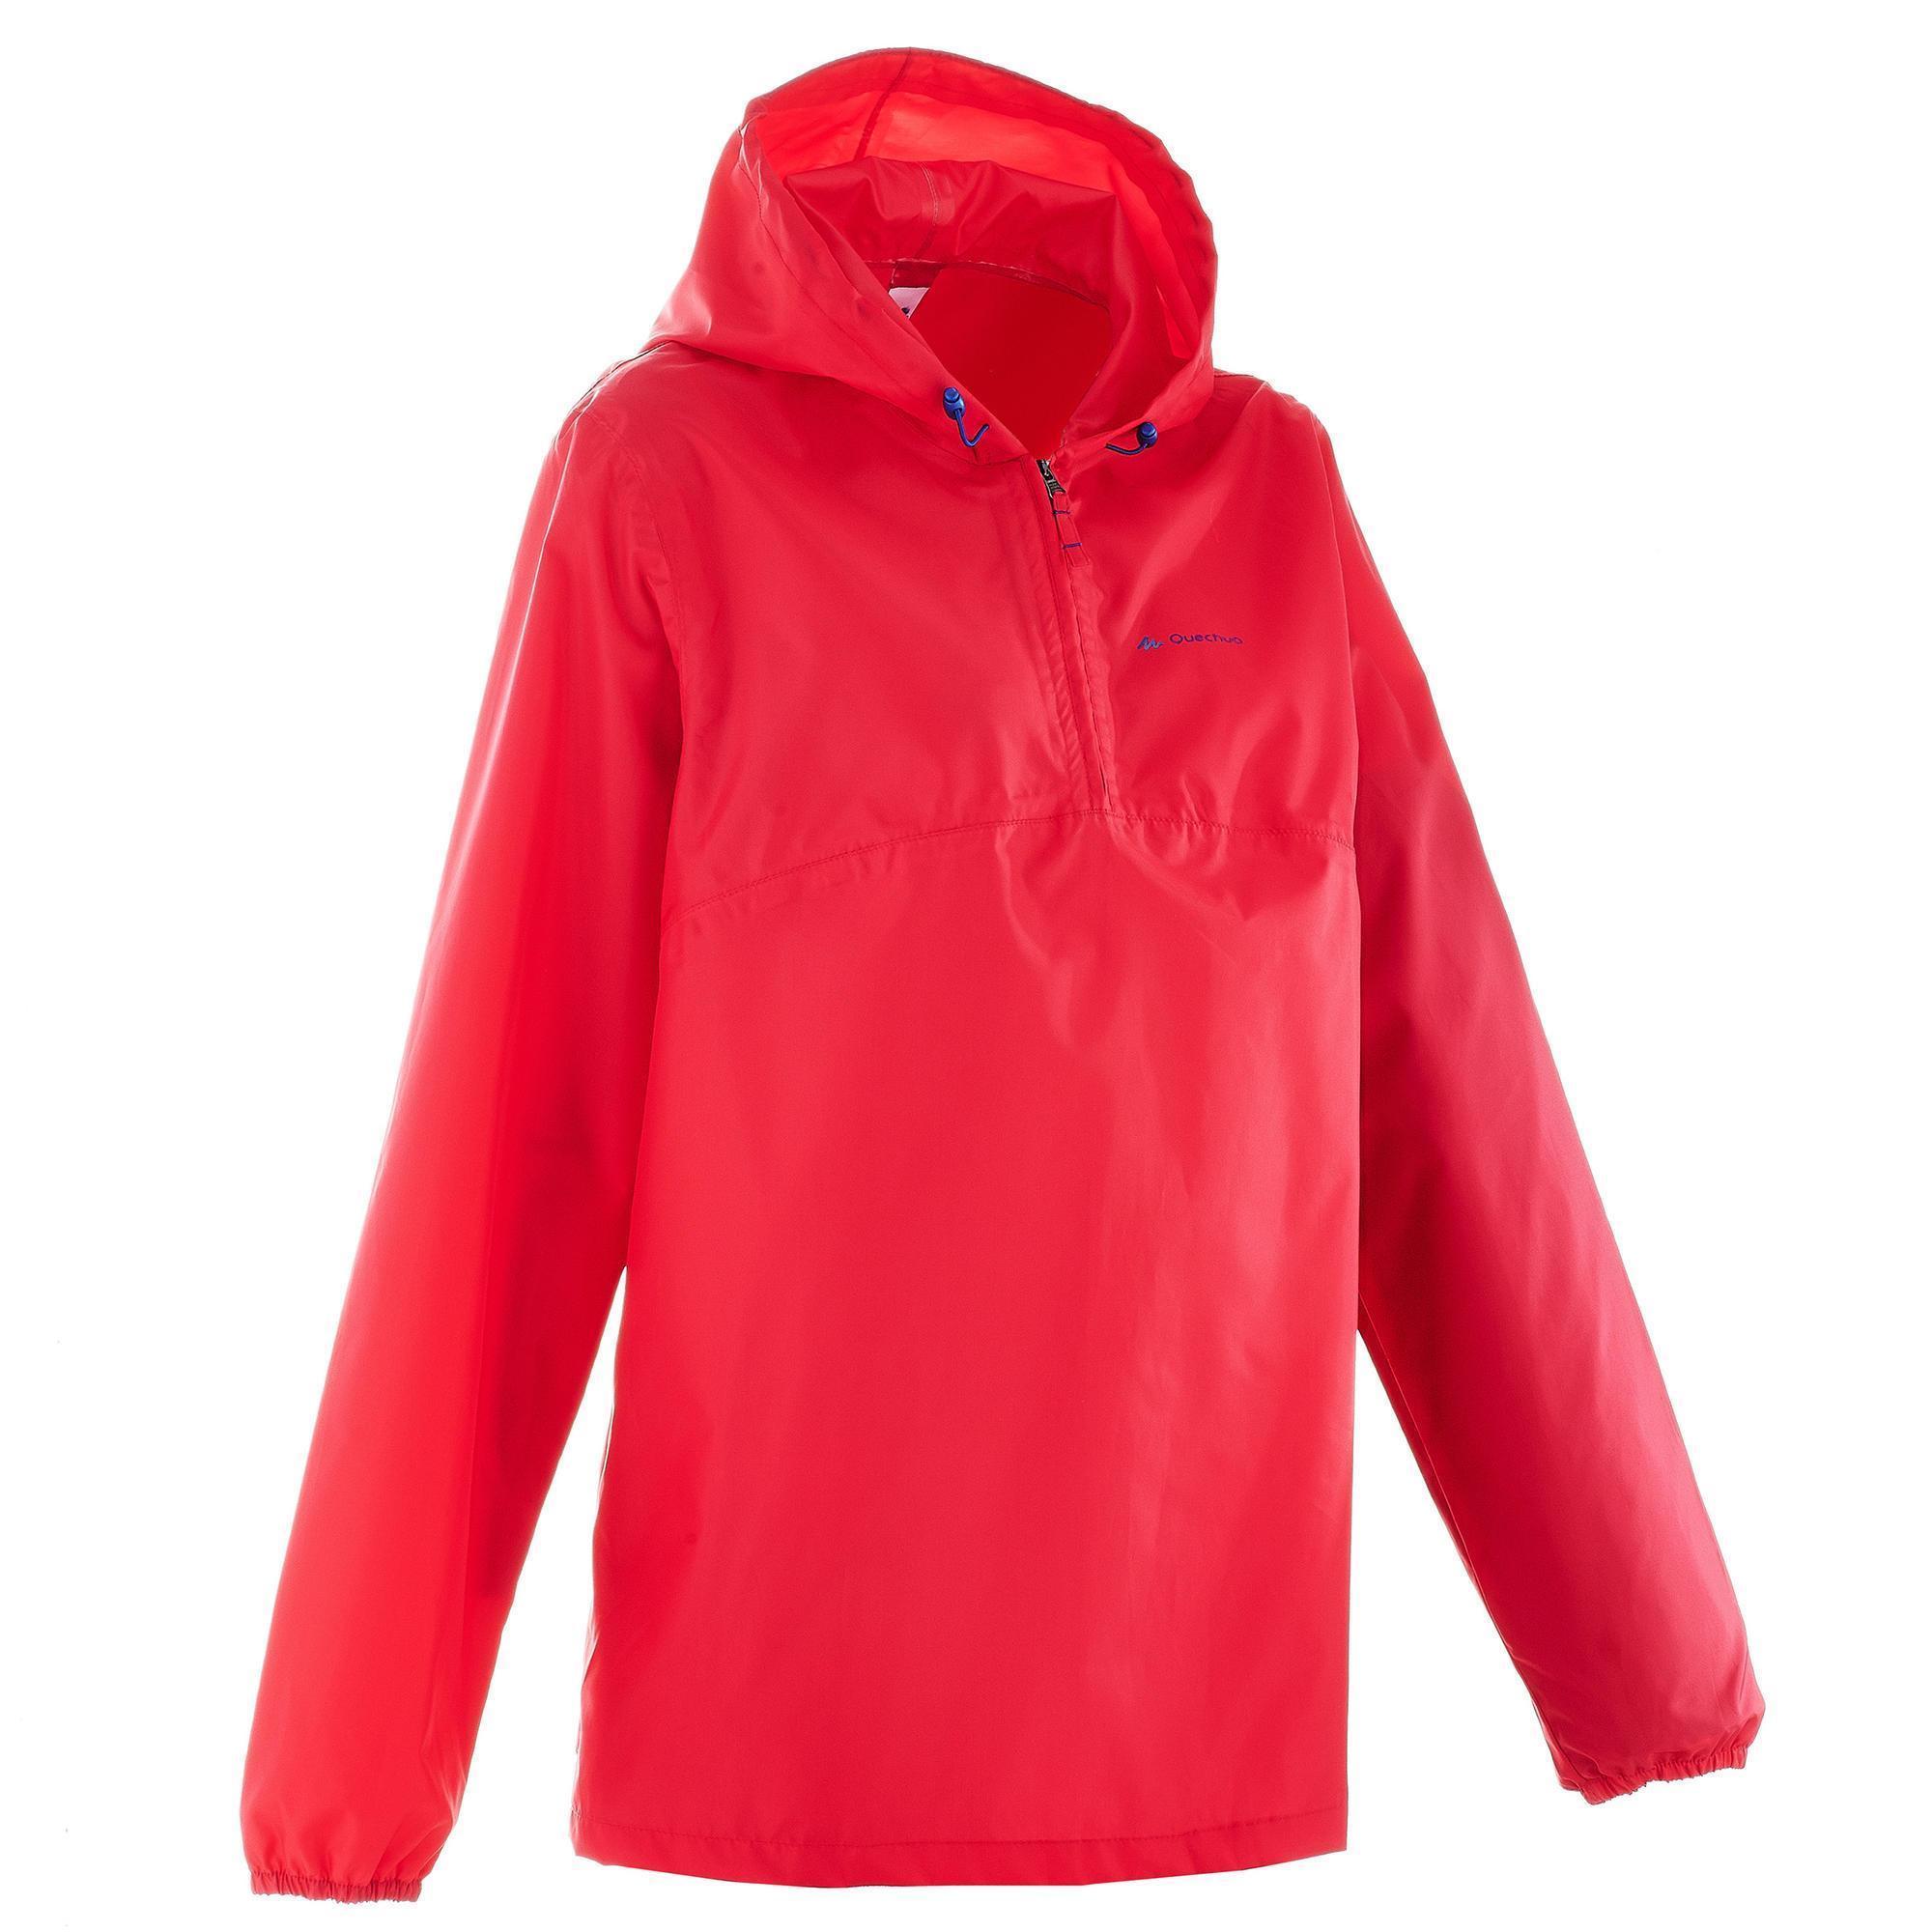 Raincut Women's Waterproof Hiking Rain Jacket